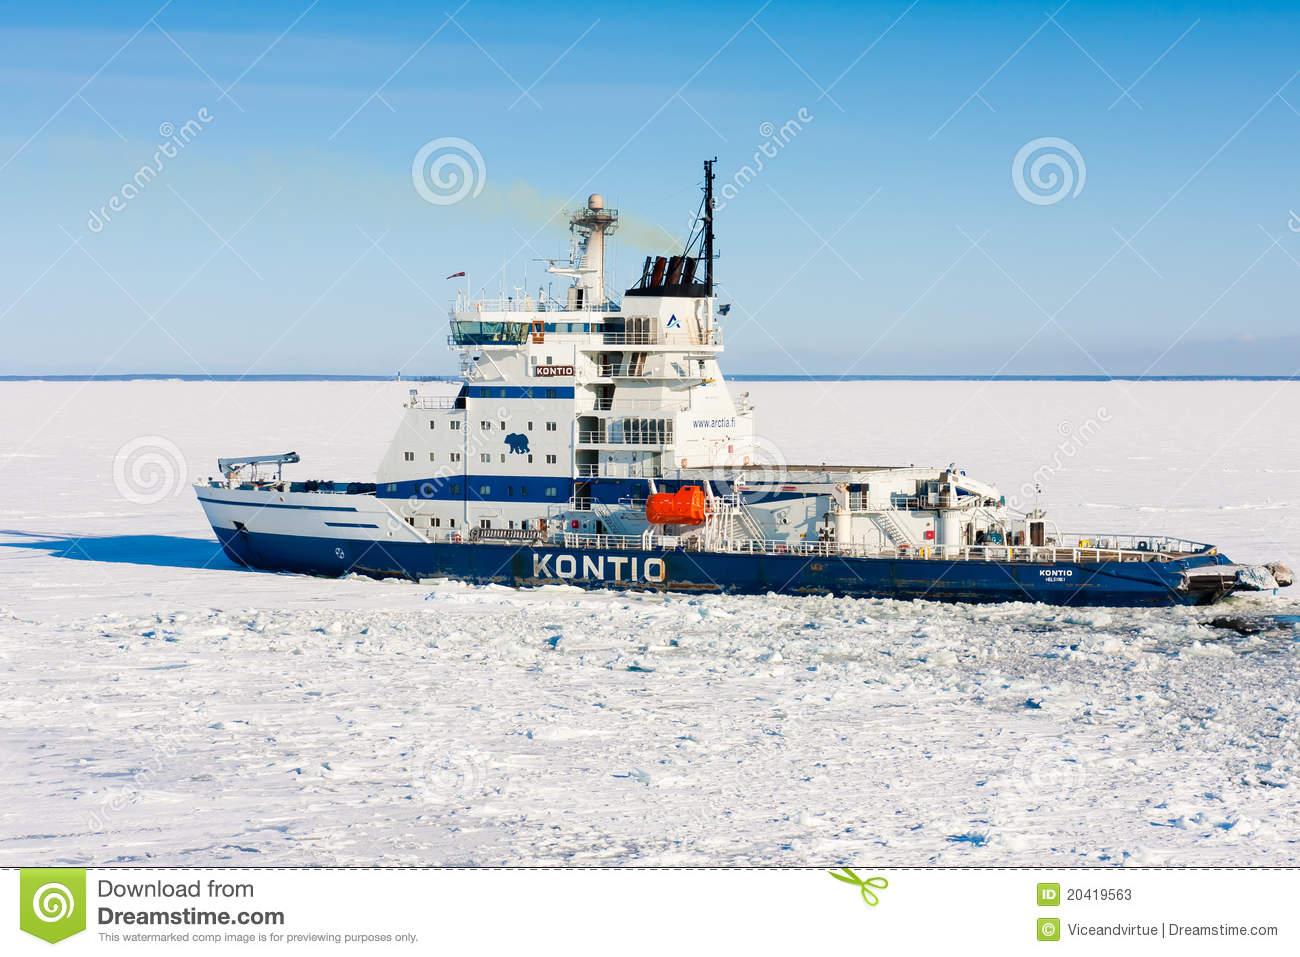 Icebreaker Kontio Editorial Stock Photo.